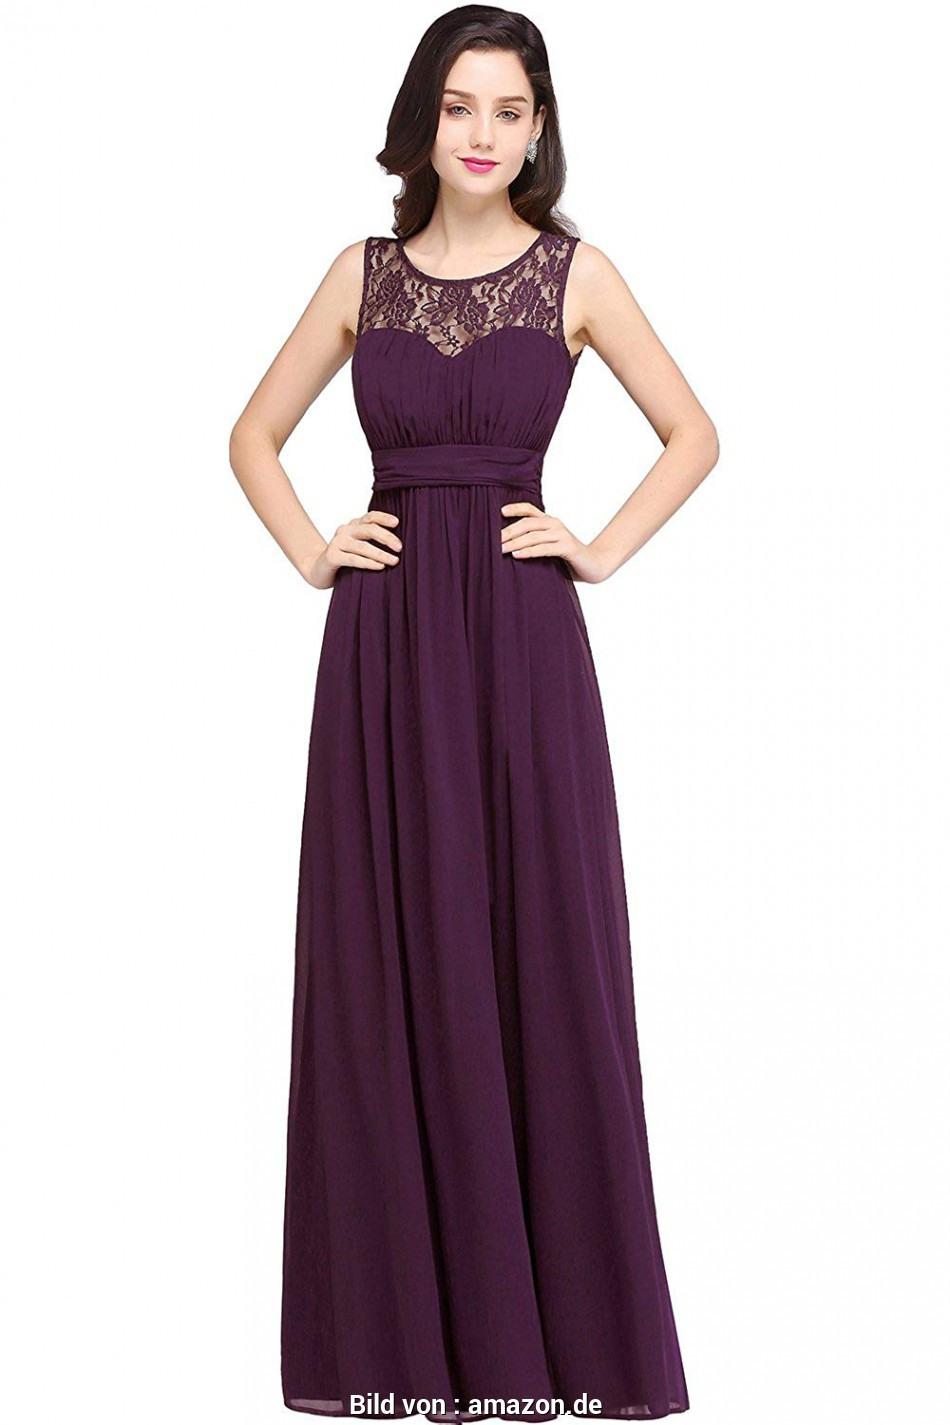 10 Fantastisch Abendkleider Bodenlang Günstig Vertrieb20 Großartig Abendkleider Bodenlang Günstig Bester Preis